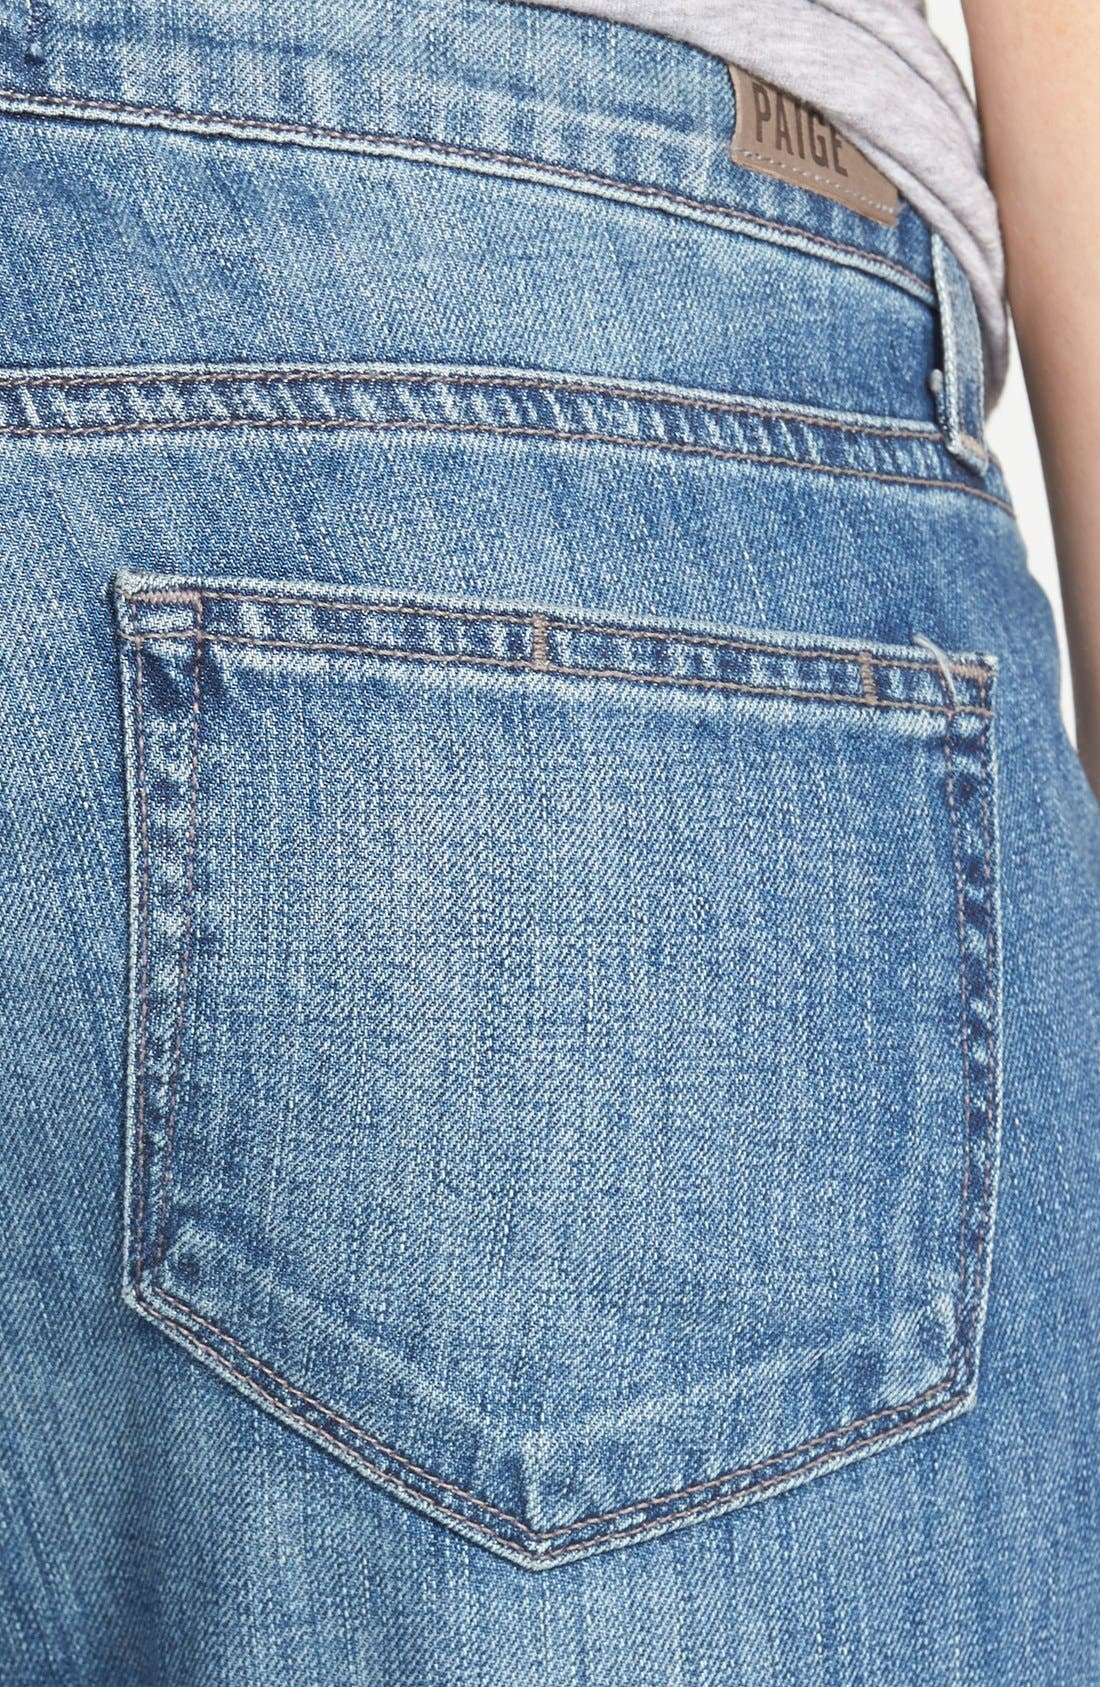 Alternate Image 3  - Paige Denim 'Porter' Boyfriend Jeans (Dazely)